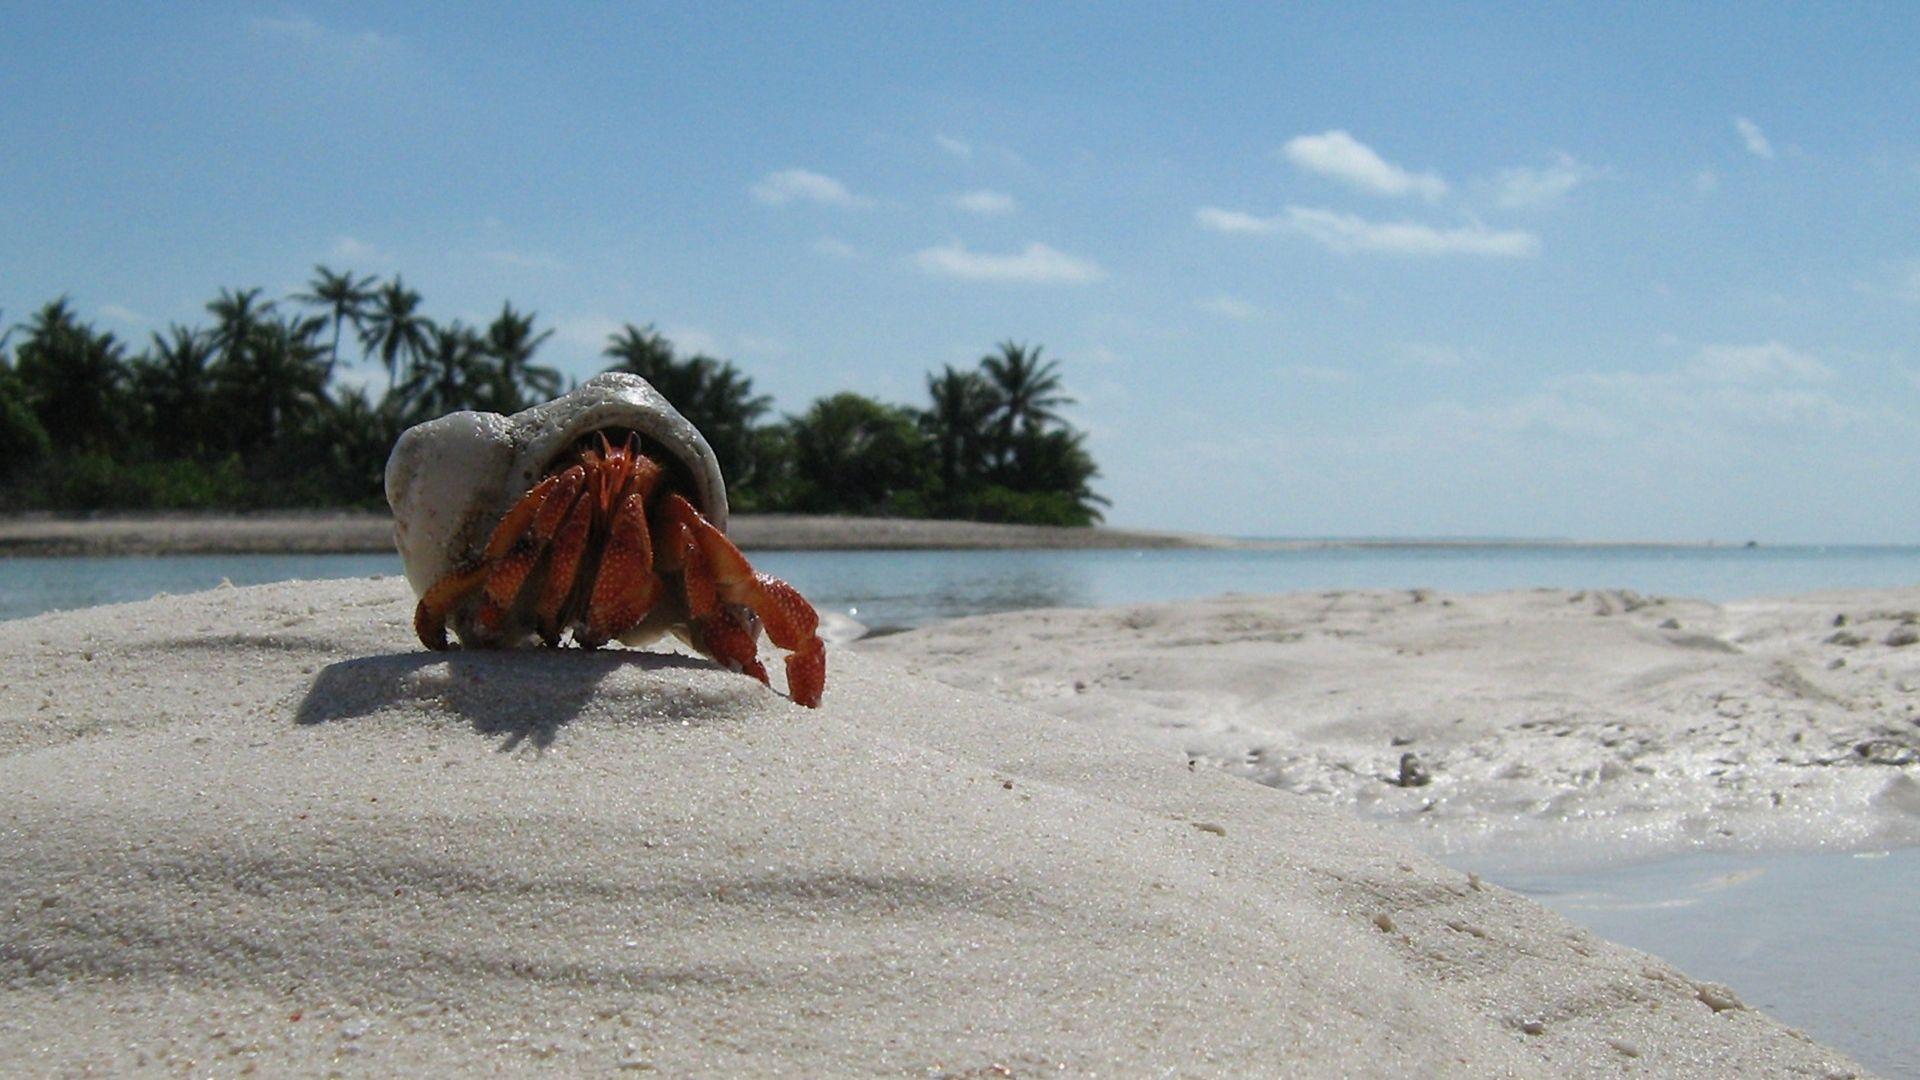 Crab download wallpaper image